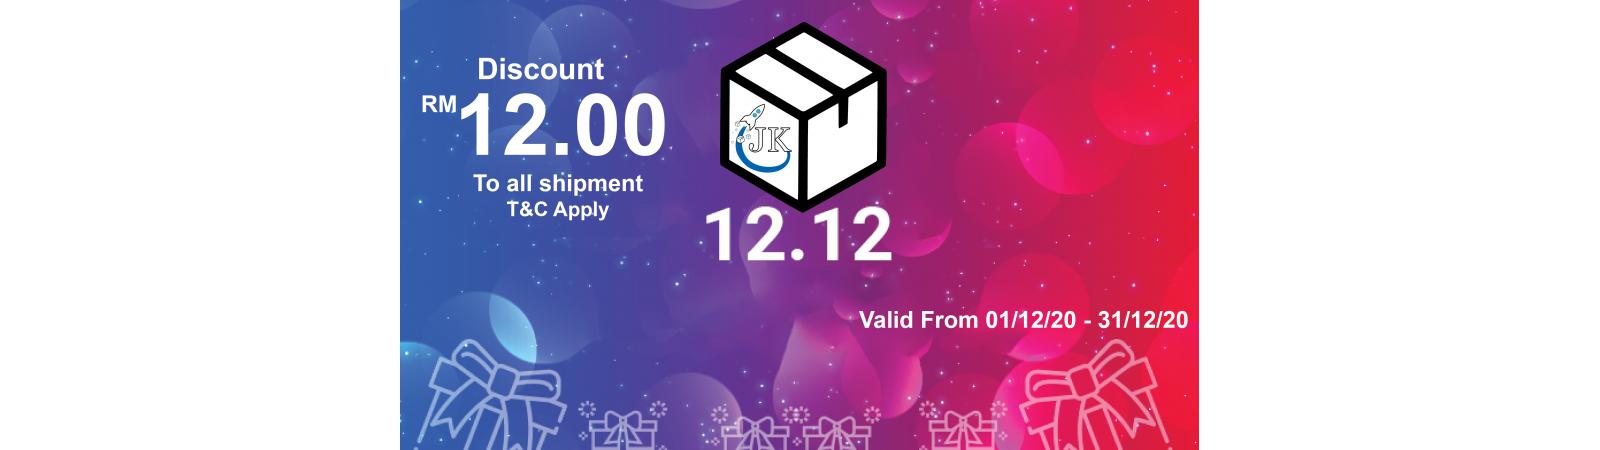 12.12 Promotion